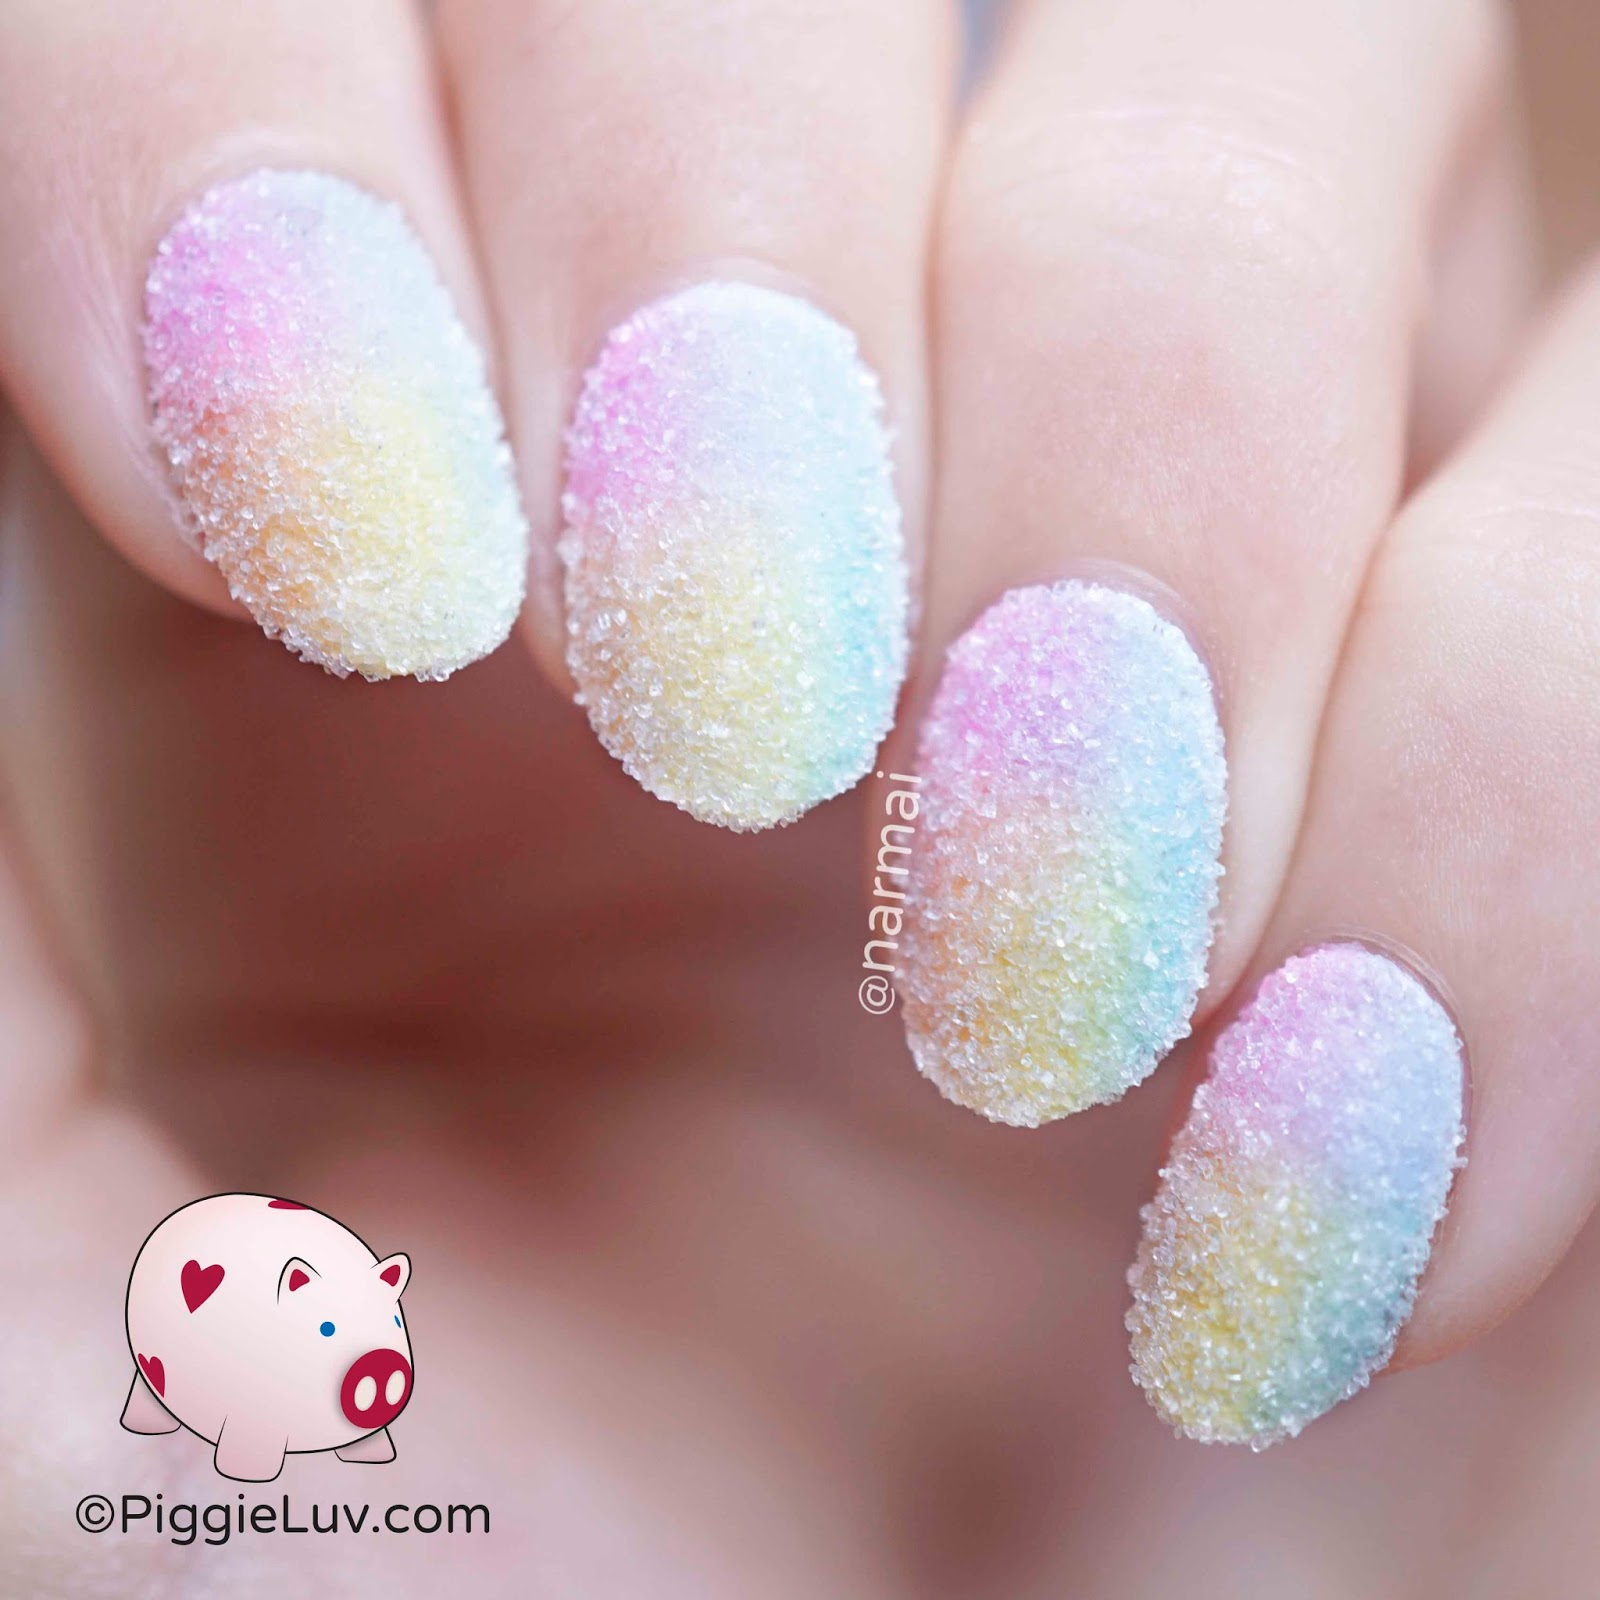 Piggieluv Pastel Sugar Crush Nail Art